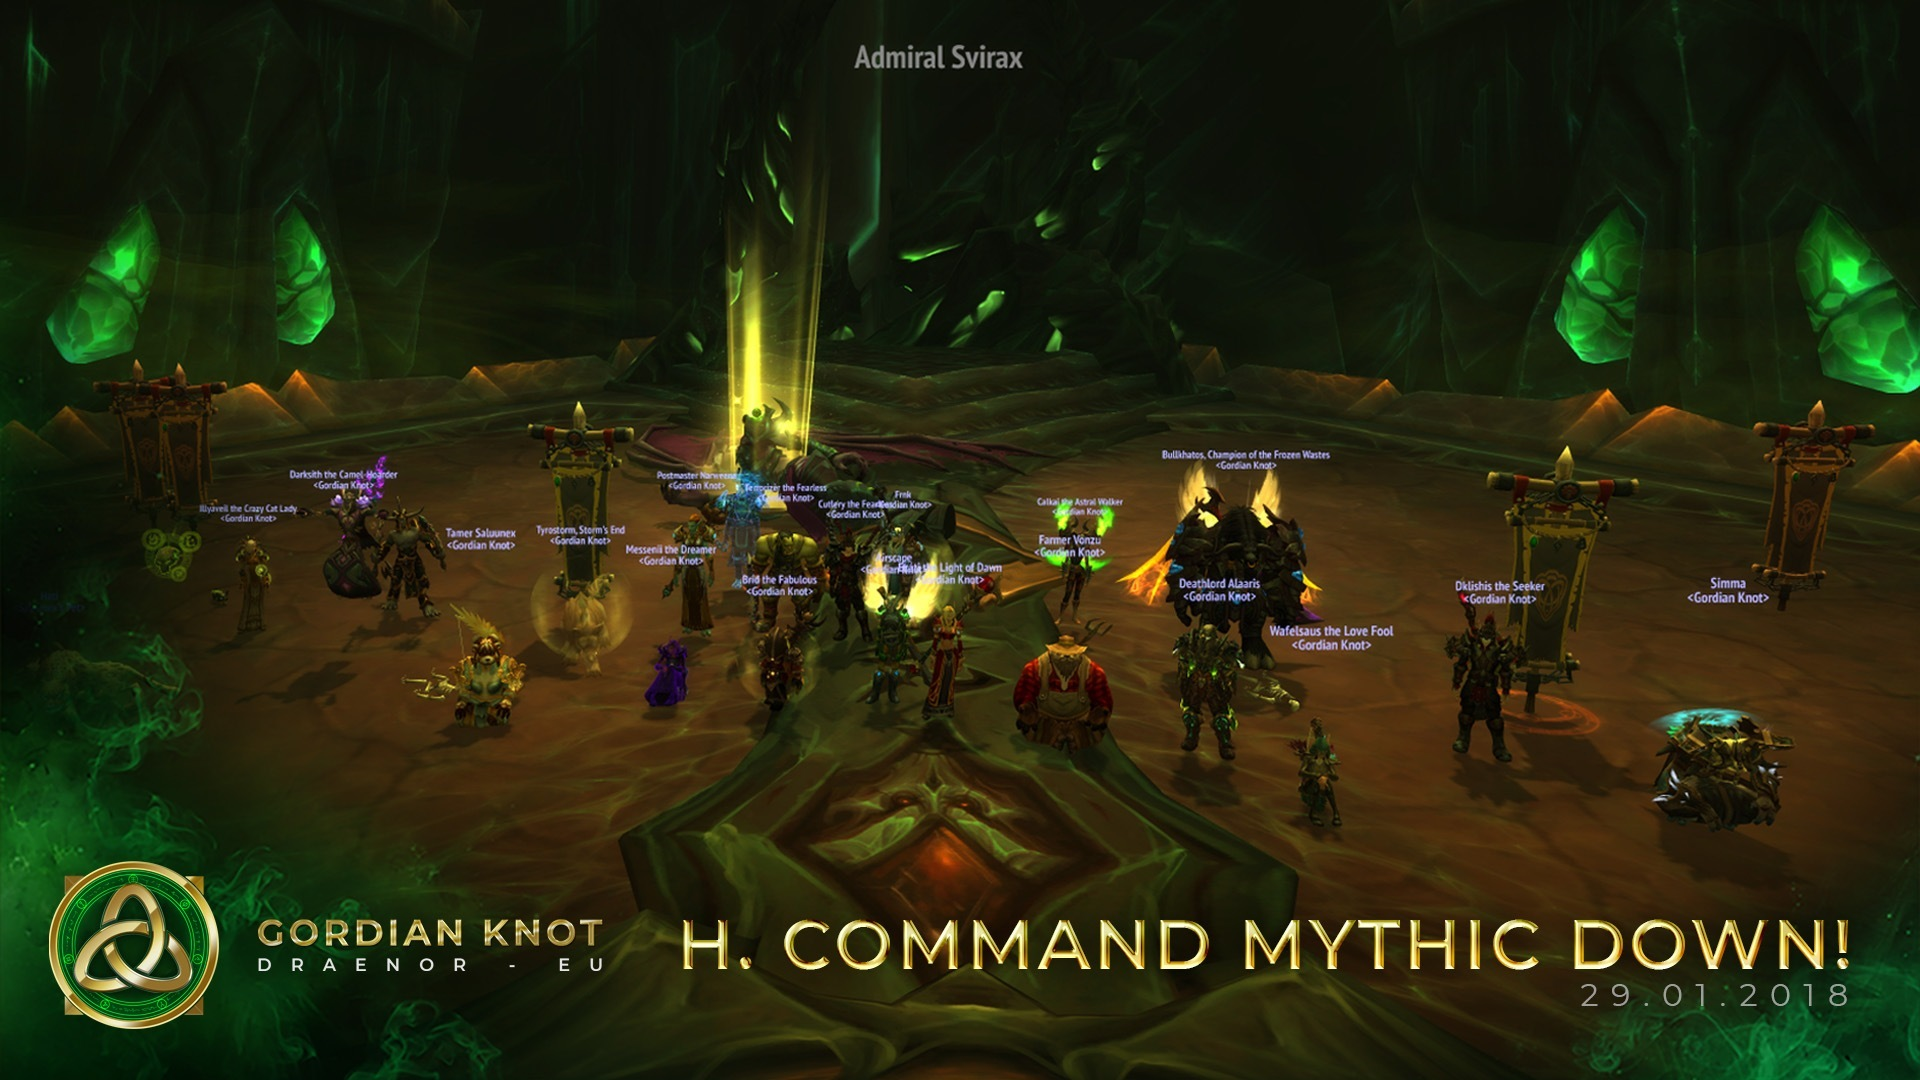 H. Command Mythic